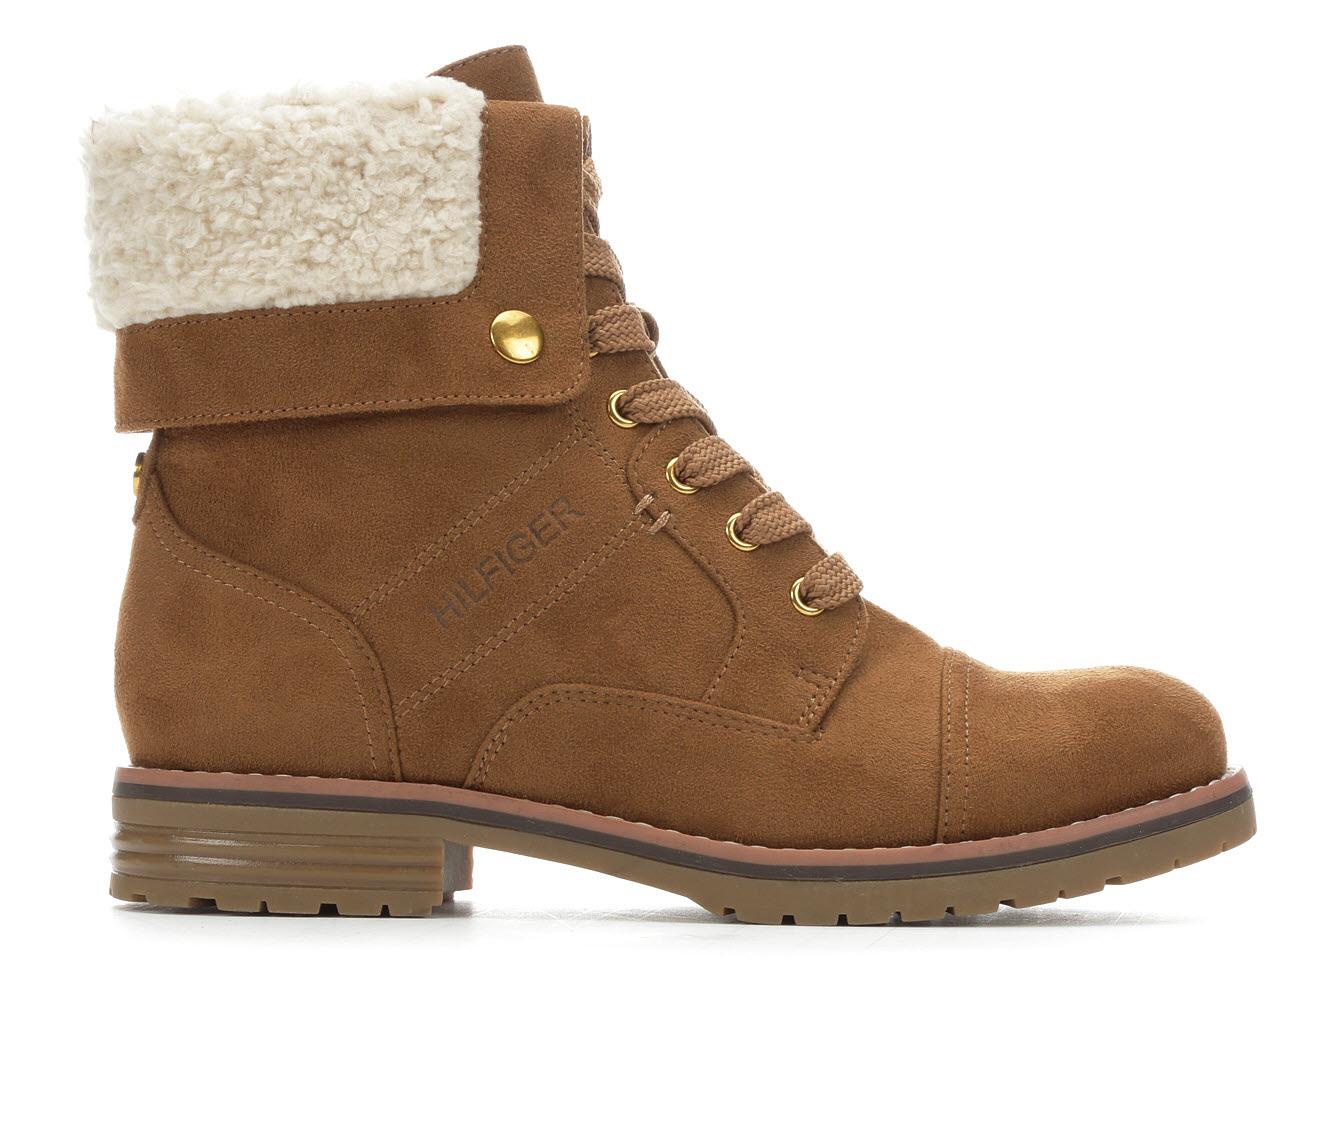 Tommy Hilfiger Oray 2 Women's Boots (Beige - Canvas)